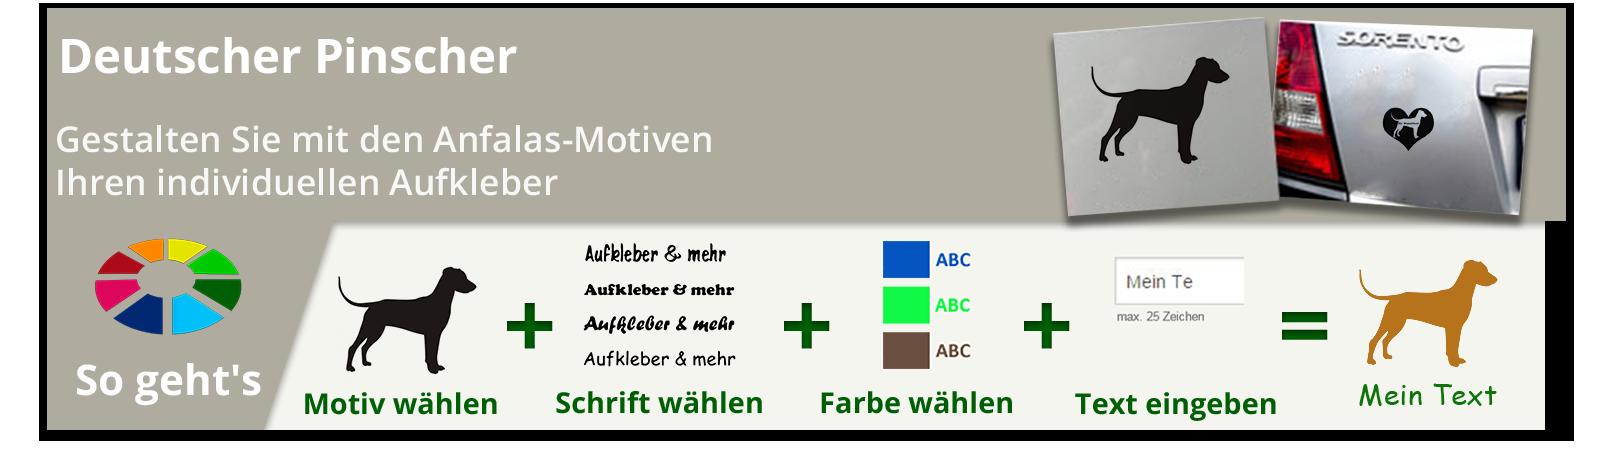 Deutscher Pinscher Wandtattoos